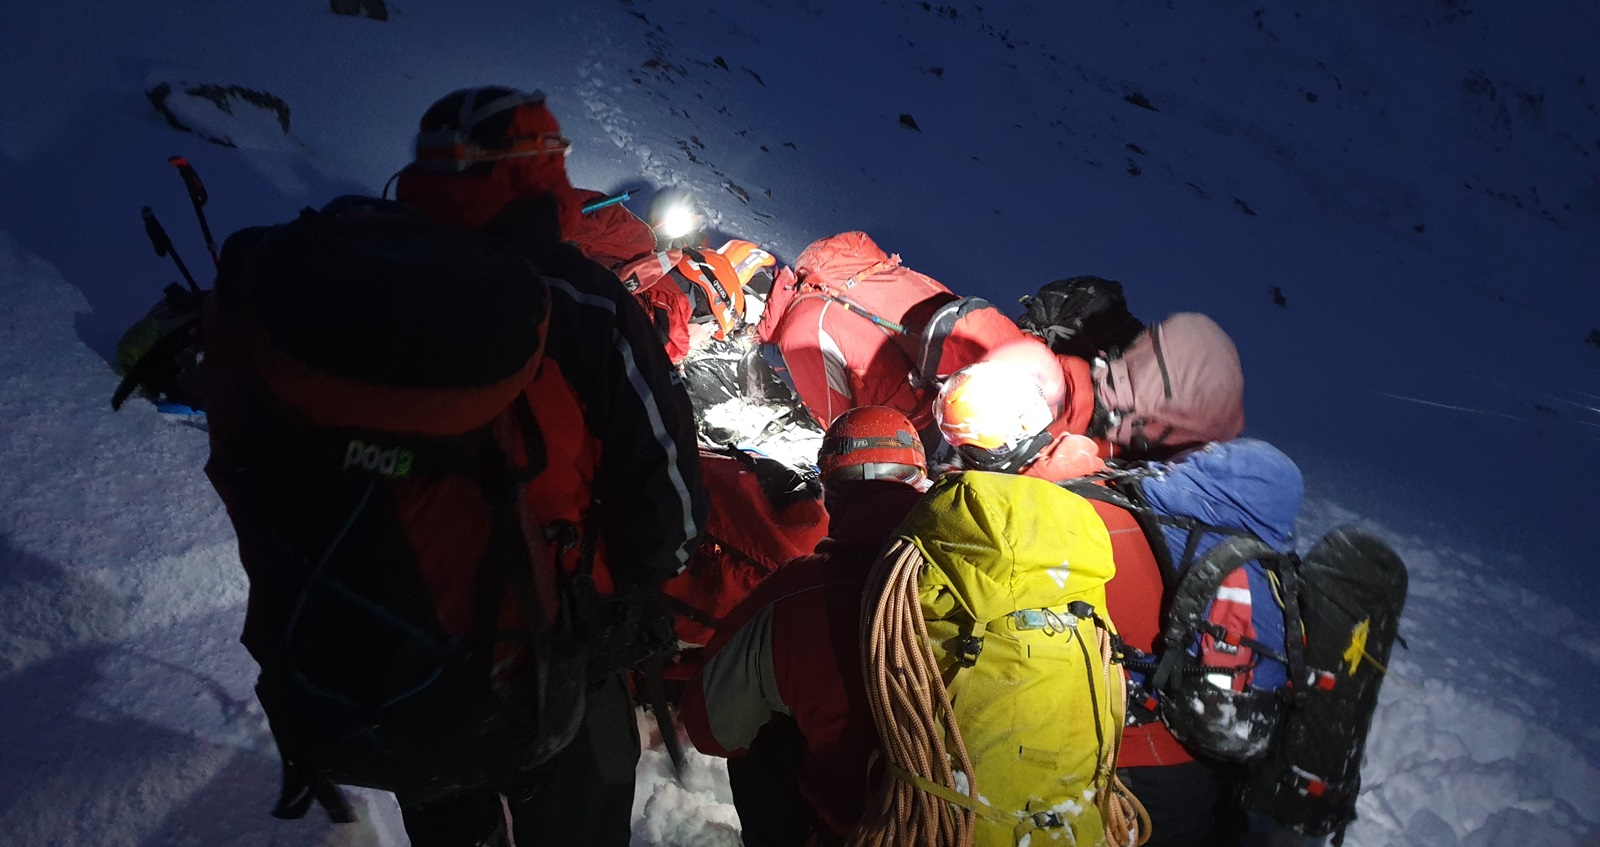 The RAF mountain rescue team helping an injured walker of Mount Snowdon